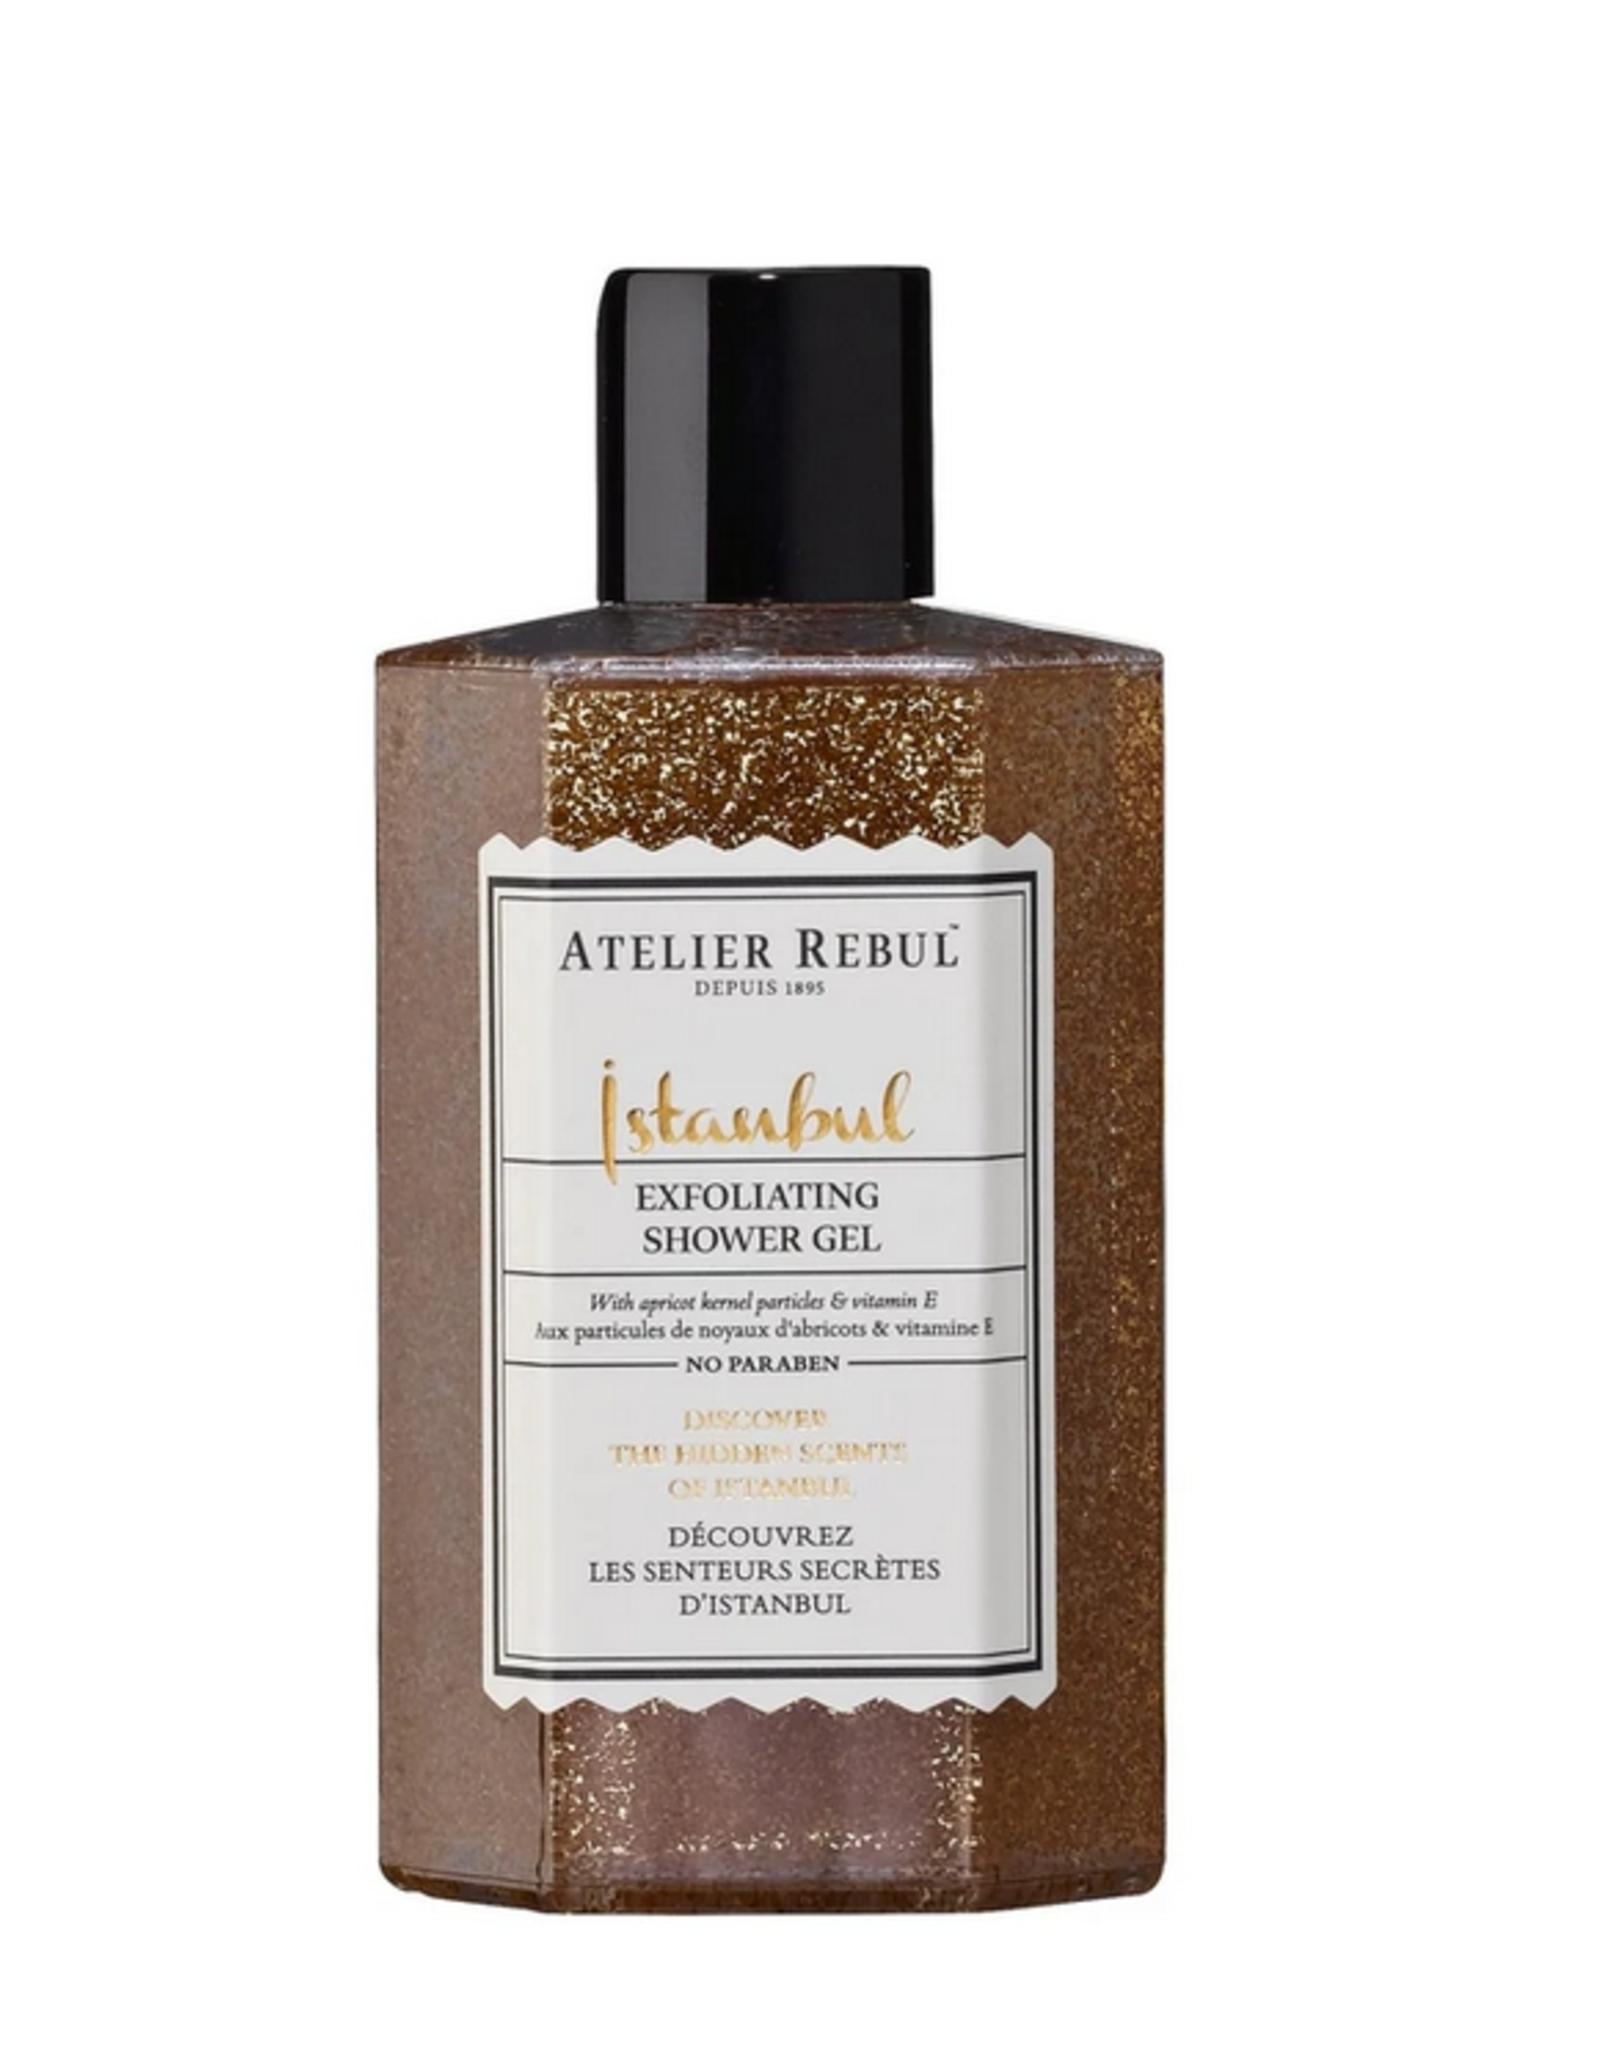 Atelier Rebul Atelier Rebul - Istanbul - Exfoliating Shower Gel - 250ml